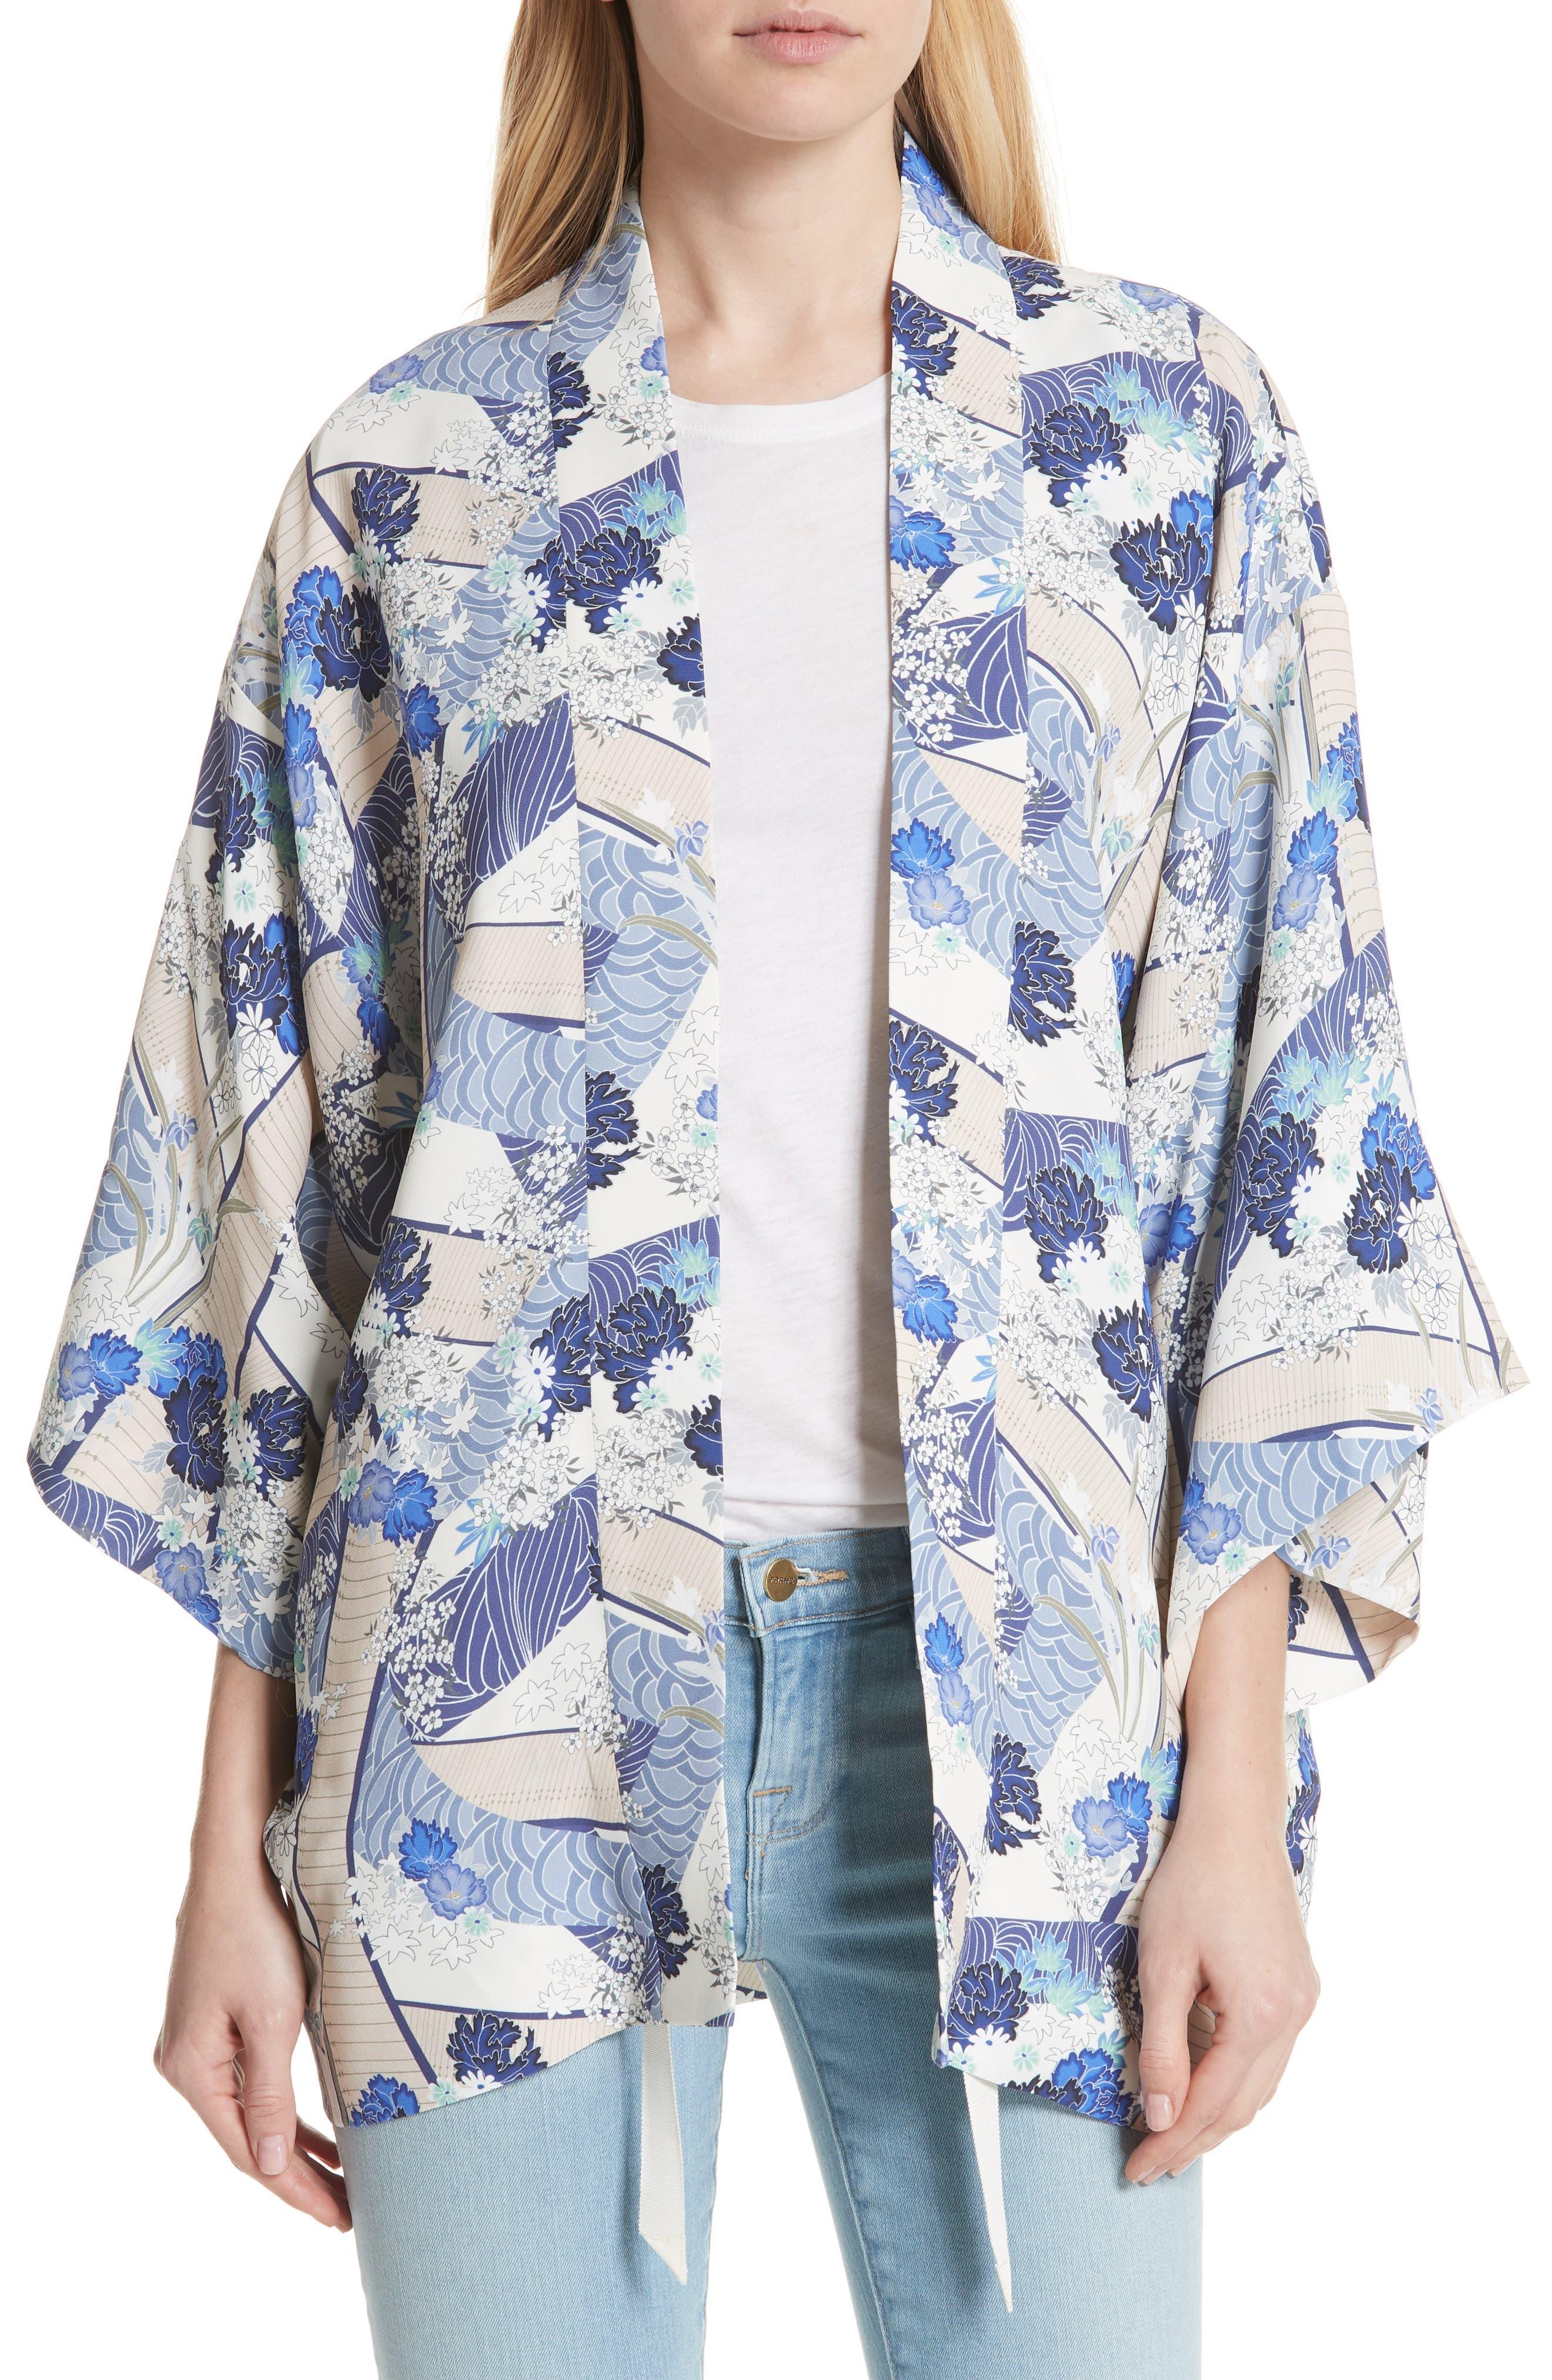 Main Image - Elizabeth and James Drew Floral Print Kimono Jacket